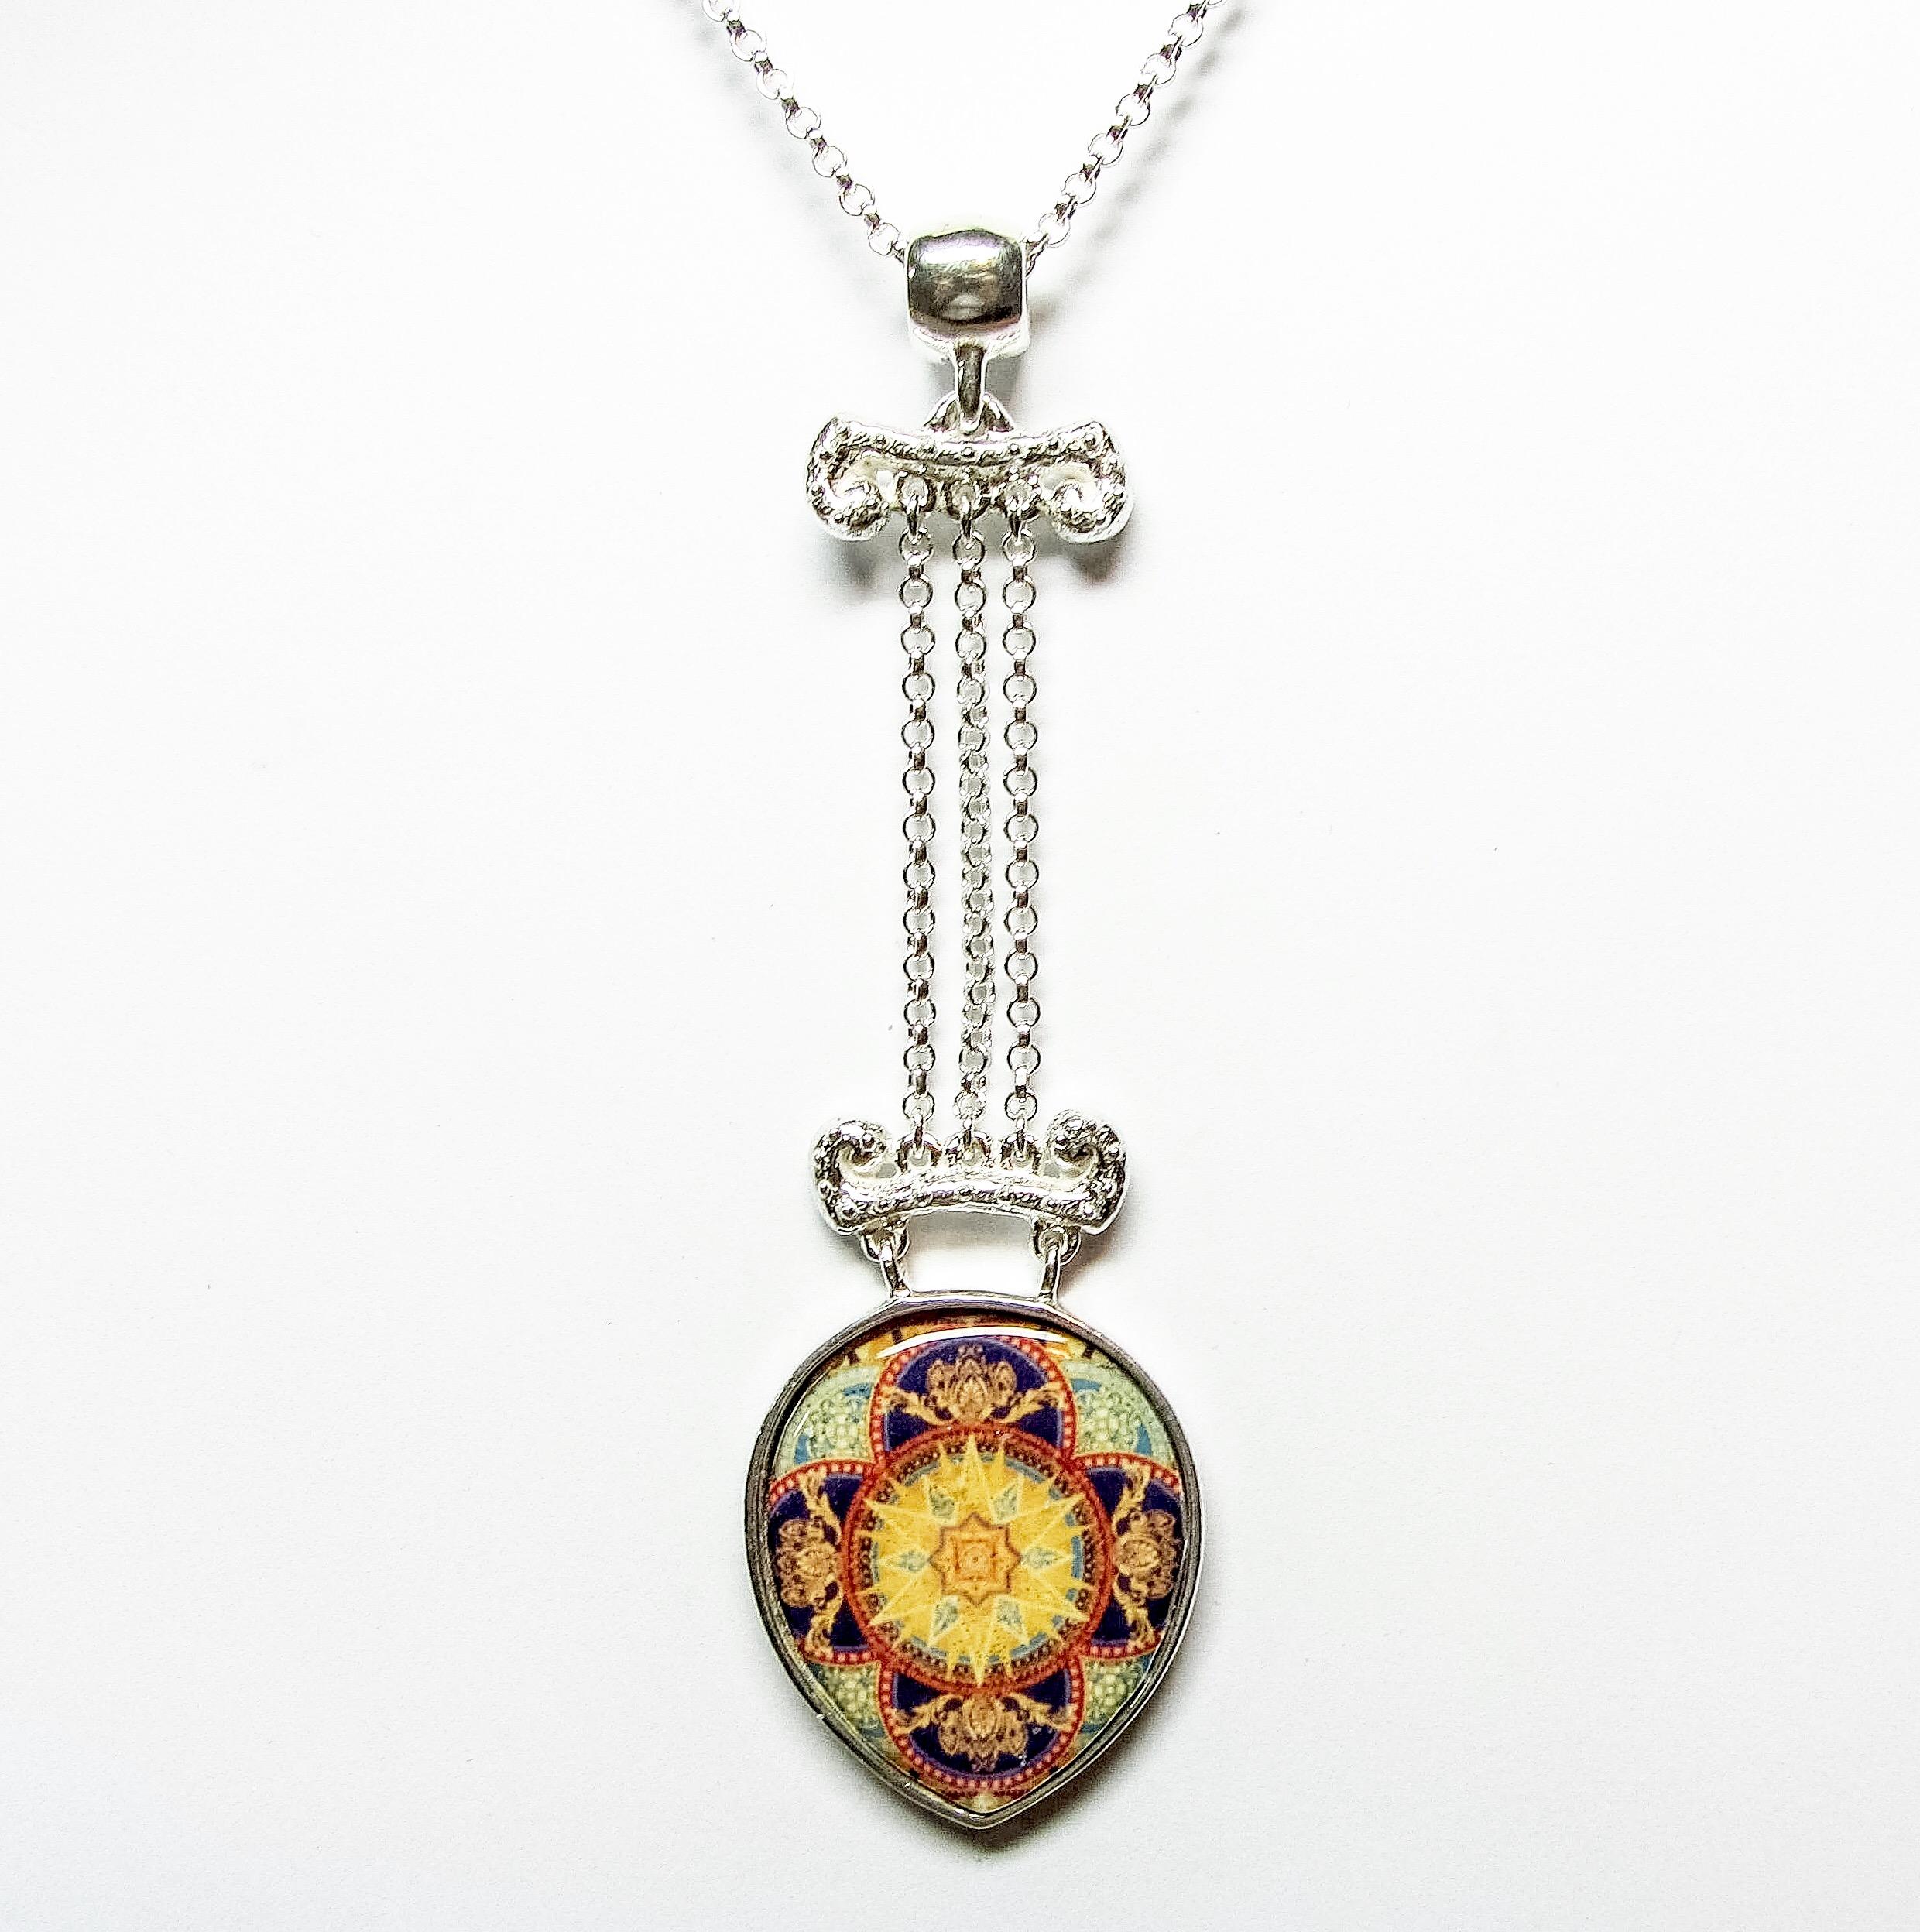 Vintage sunburst pendant link wachler design vintage sunburst pendant aloadofball Images